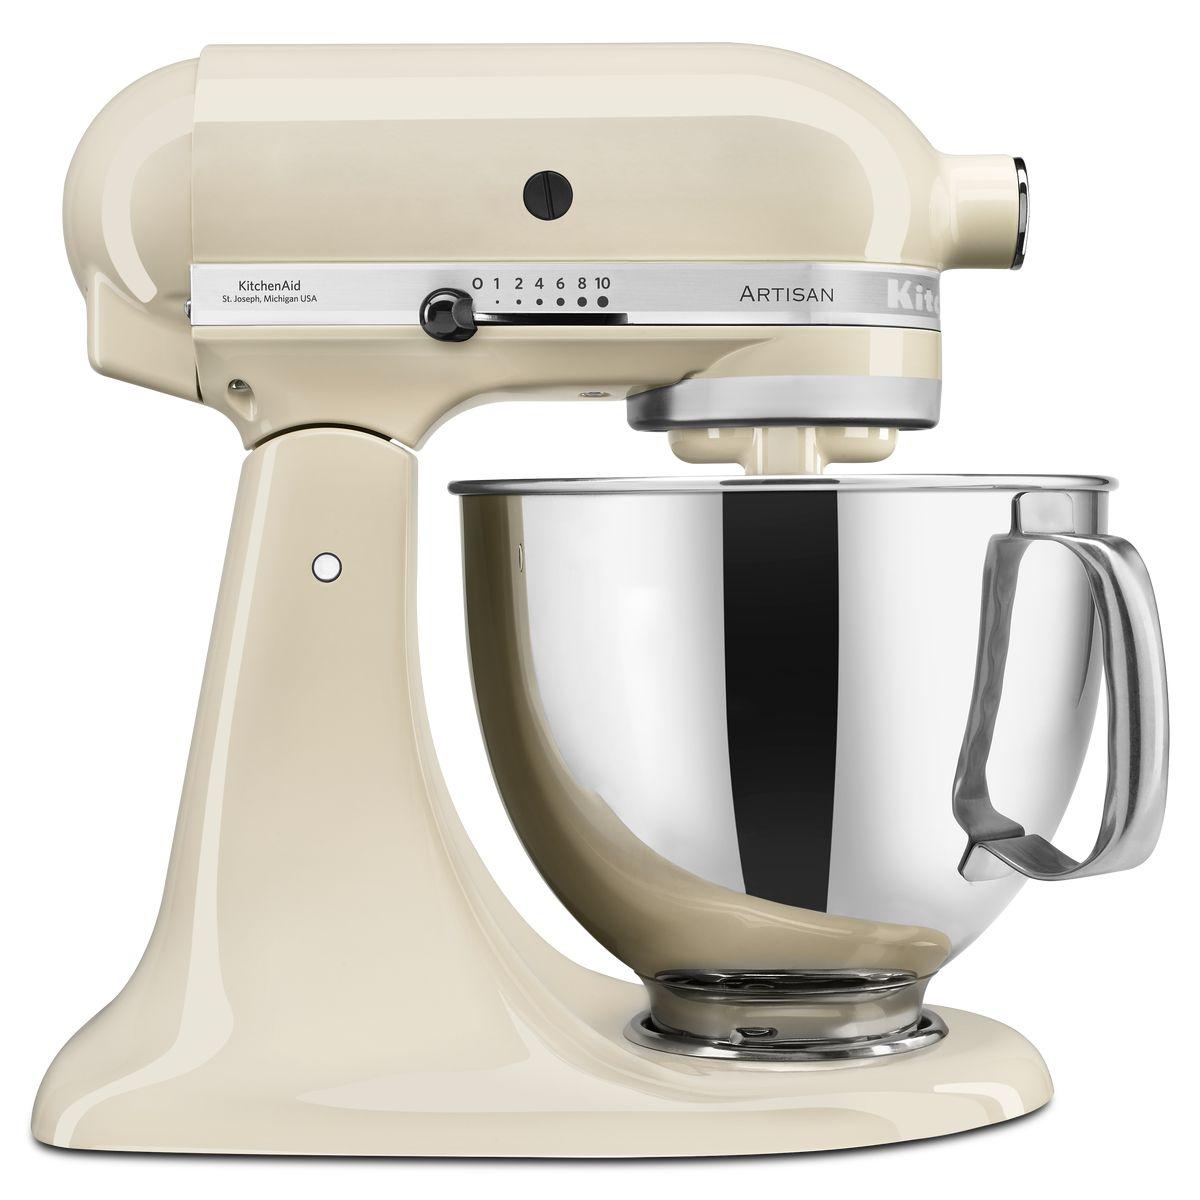 Robot pâtissier artisan crème 5KSM175PS 4.8 l - Kitchenaid